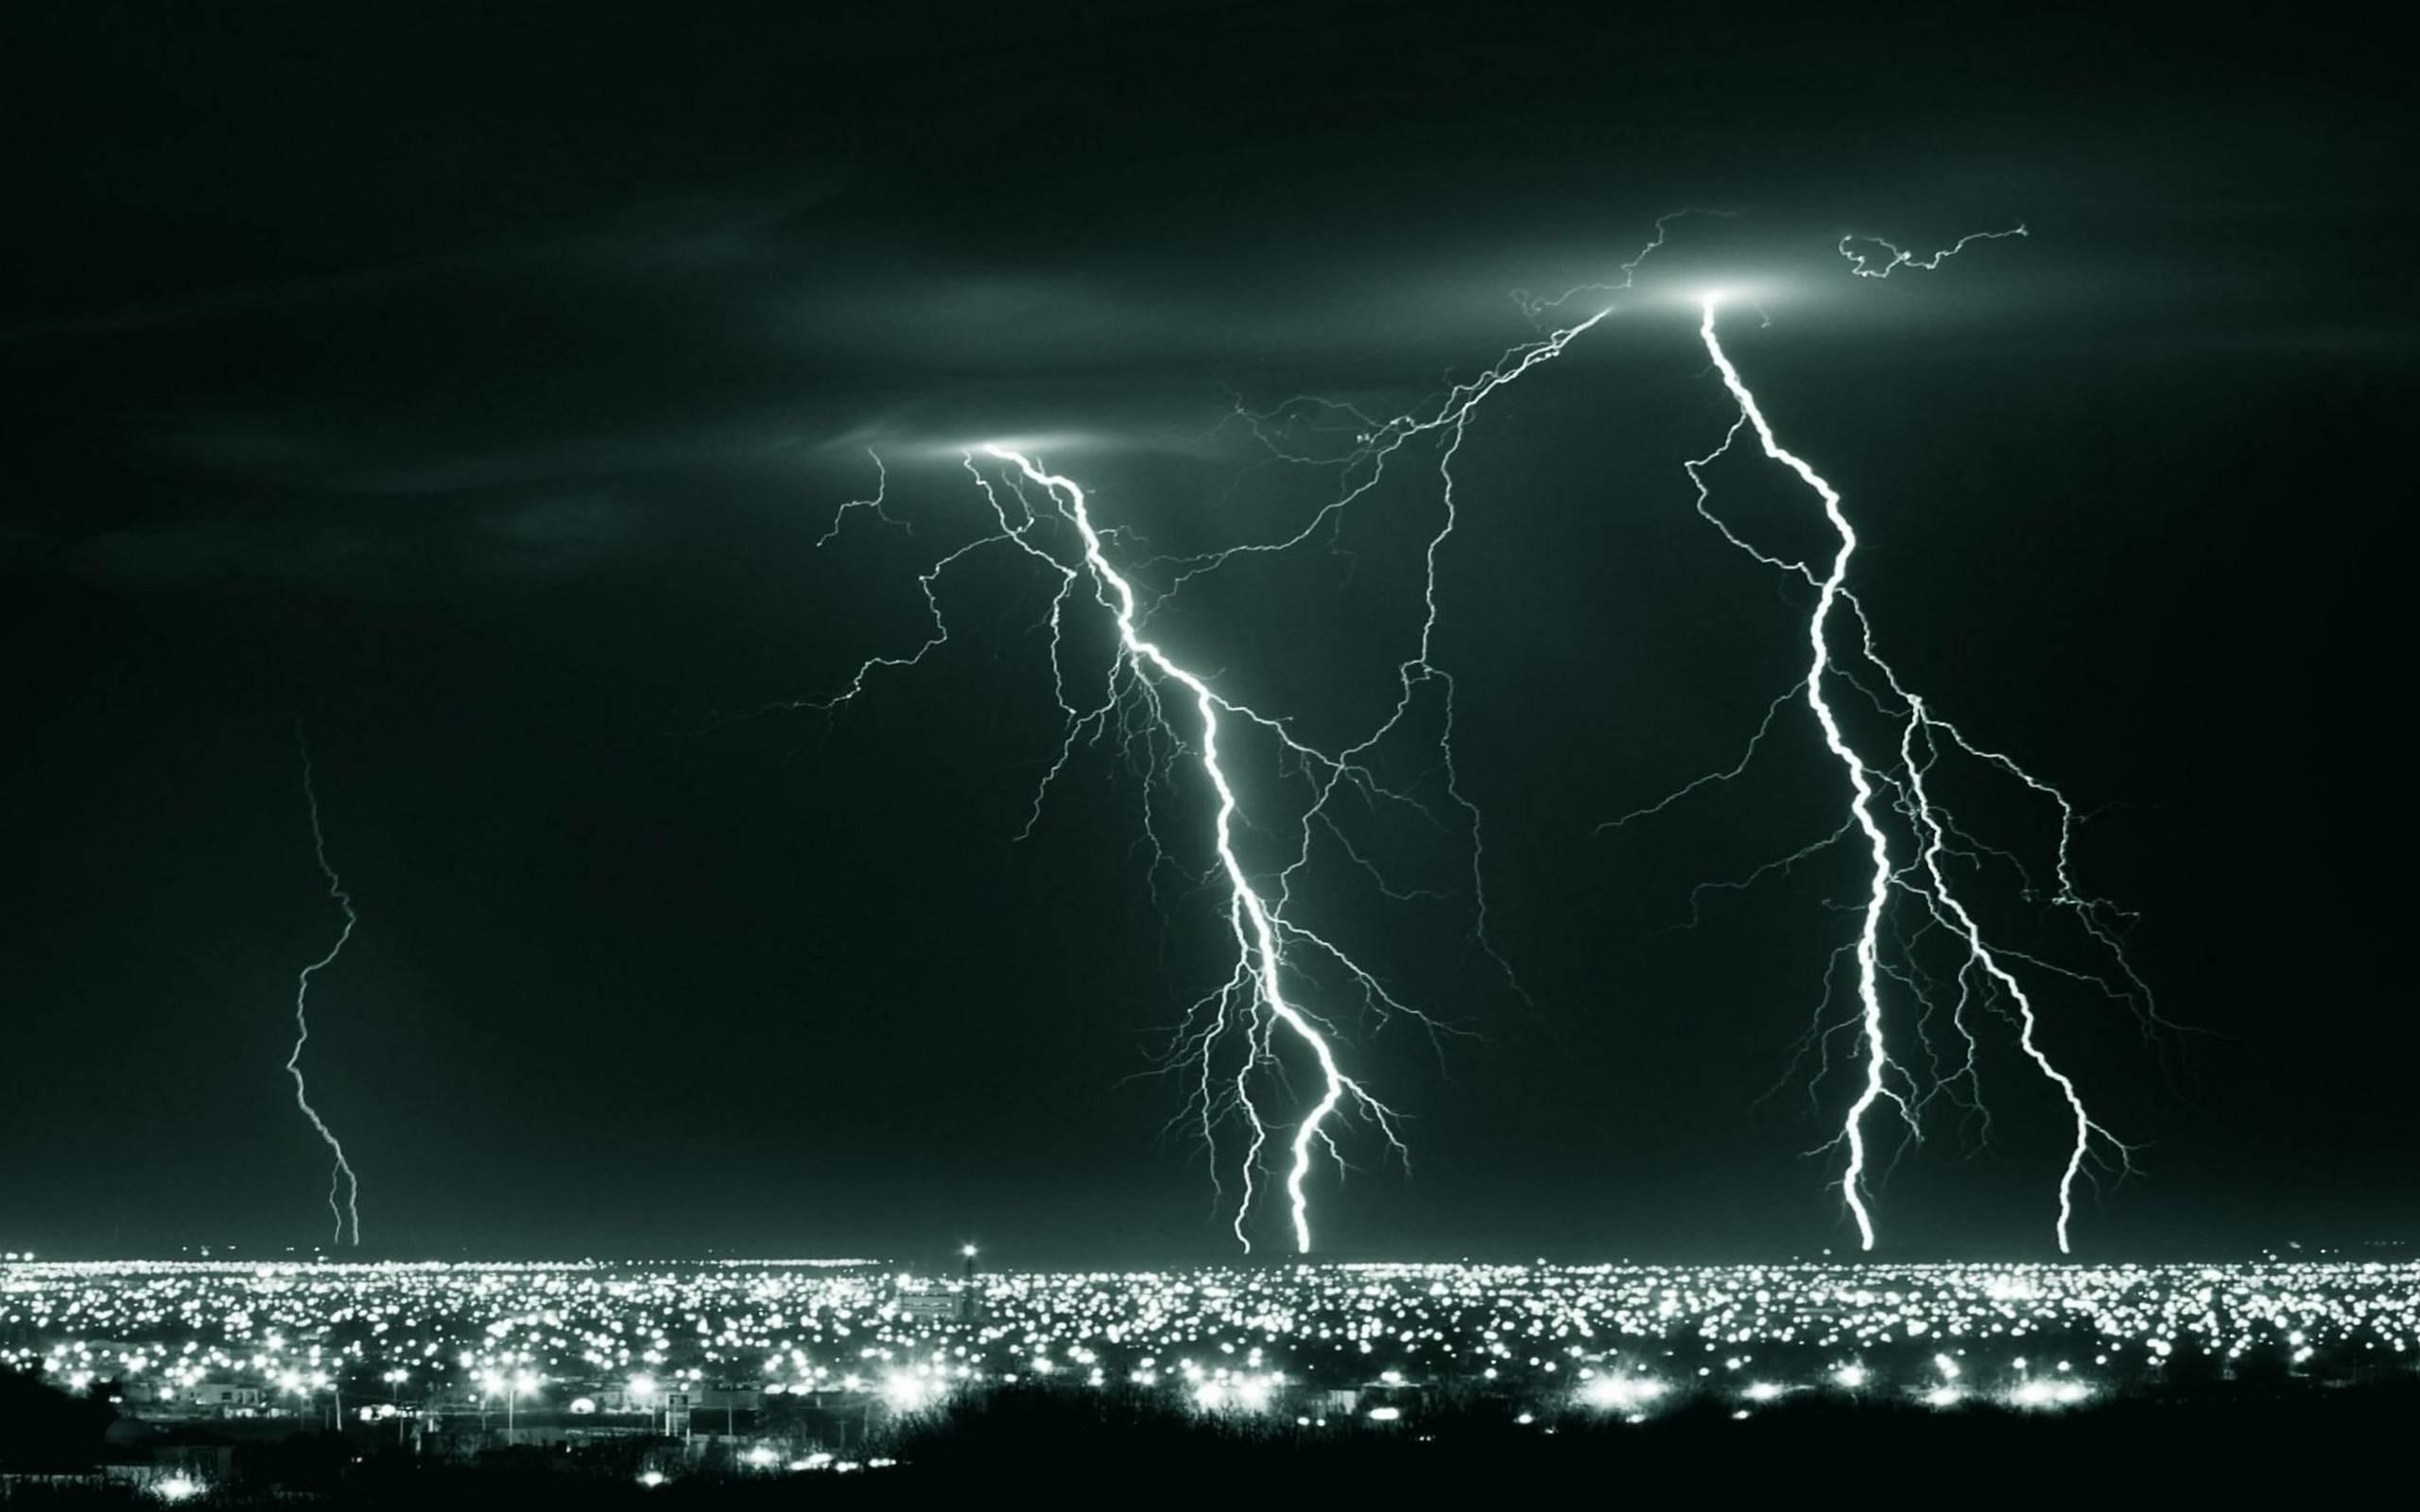 1920x1080 Lightning Bolt Strike ; Night sky with lightning and storm Stock Video Footage - VideoBlocks